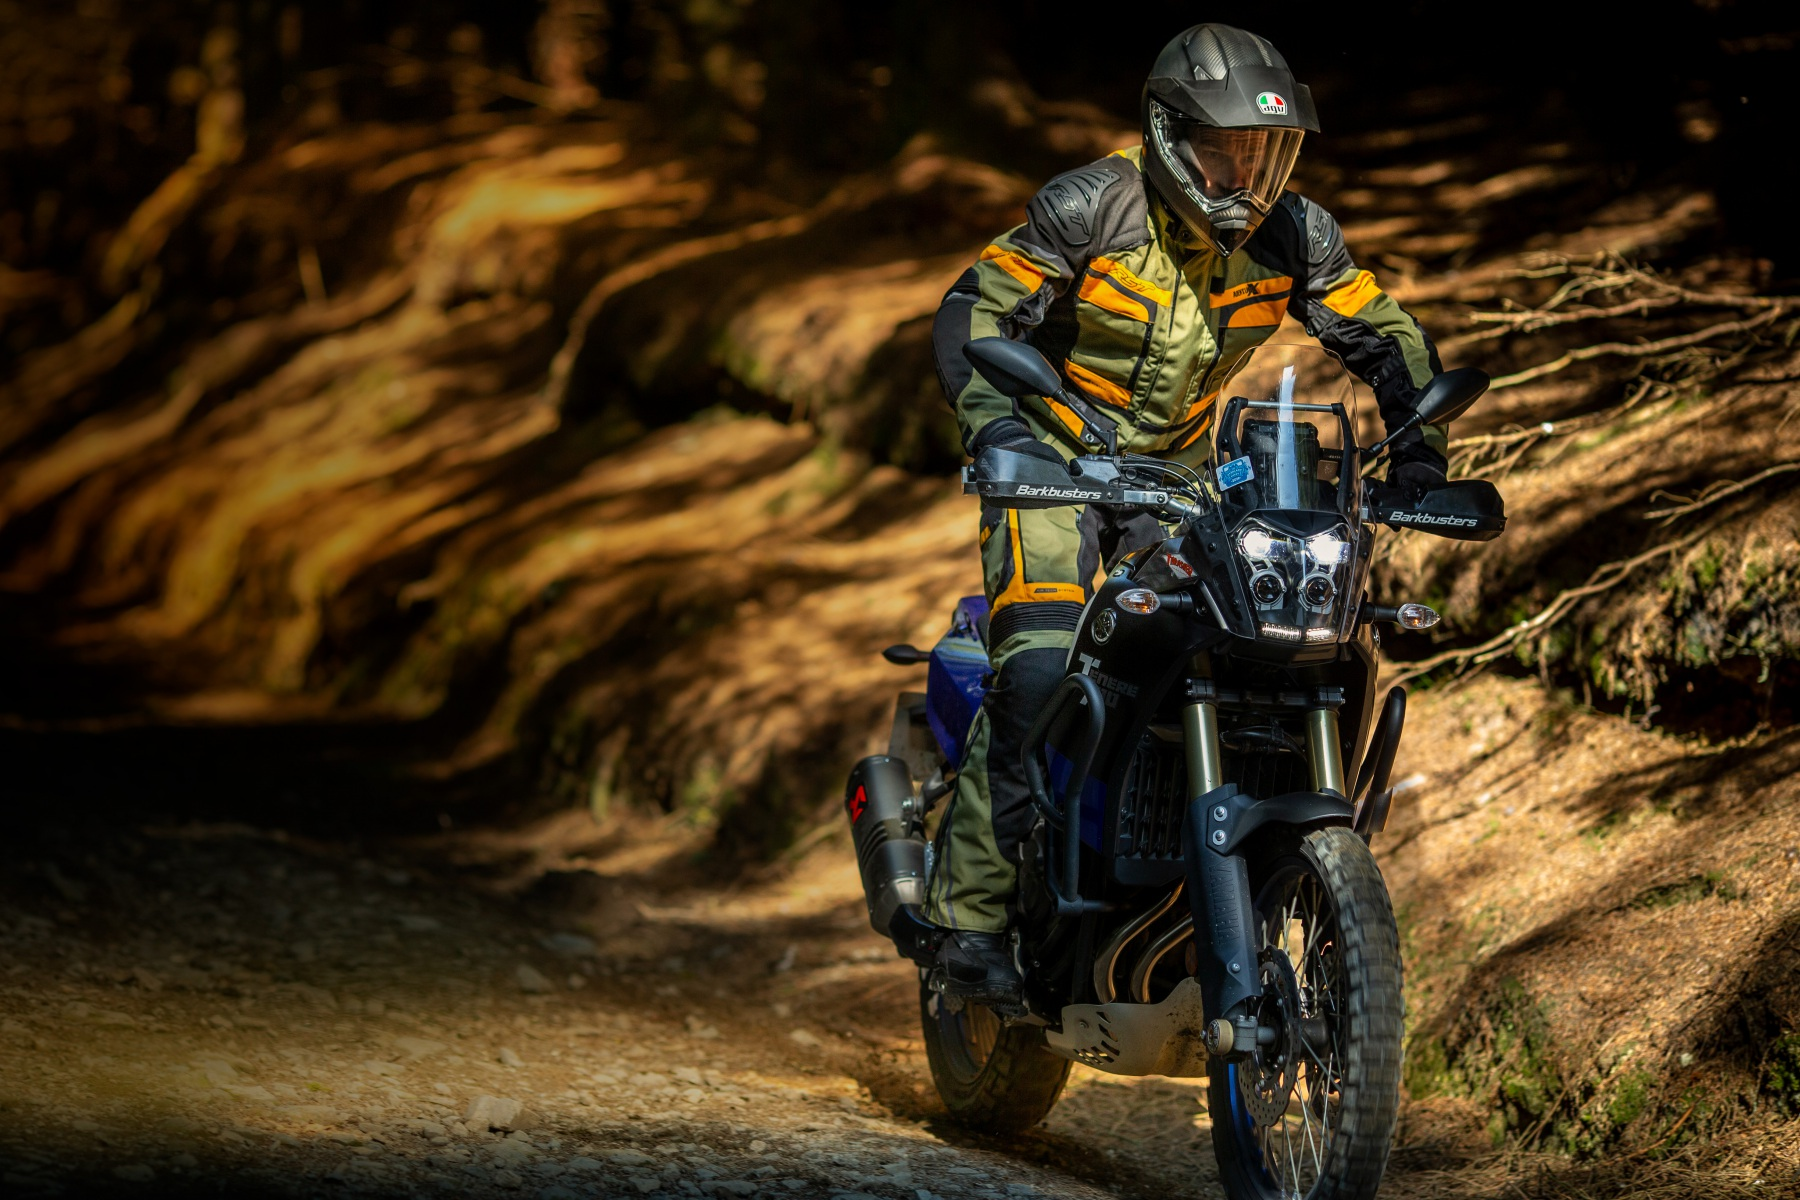 102409-rst-pro-series-adventure-x-jacket-green-lifestyle-02